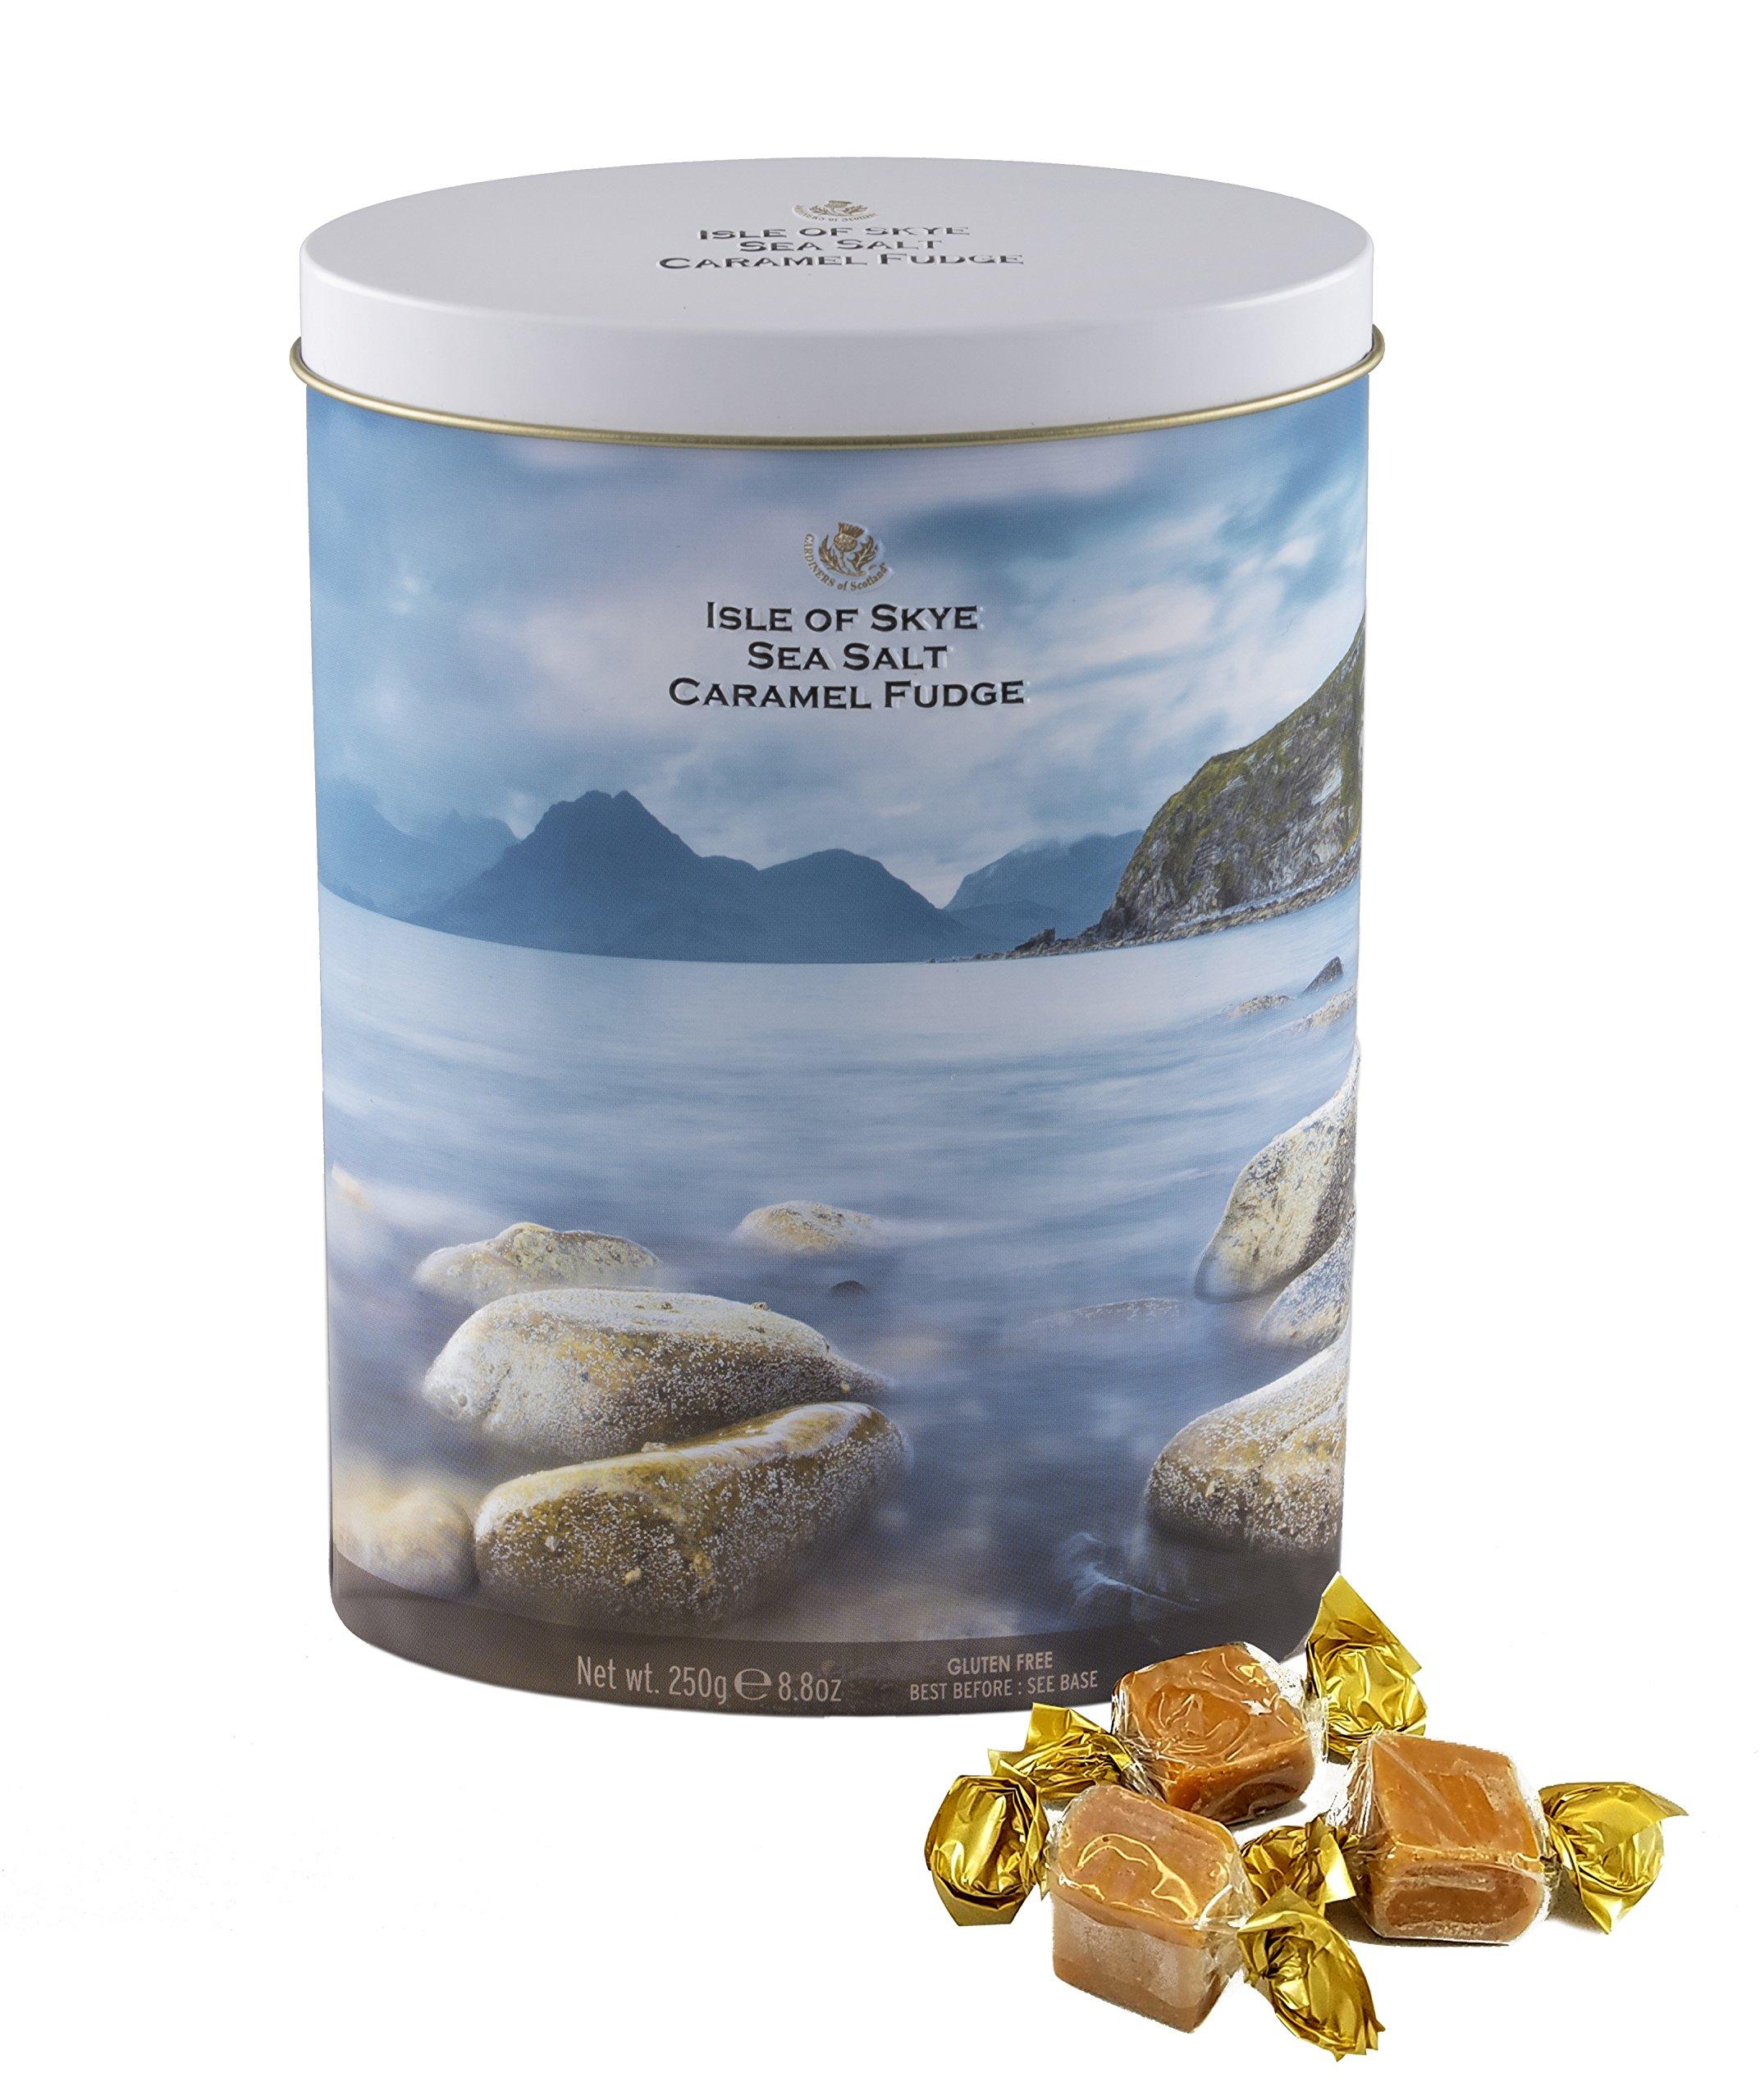 Gardiners of Scotland Isle of Skye 8.8 Ounce Sea Salt Caramel Fudge in Decorative Tin